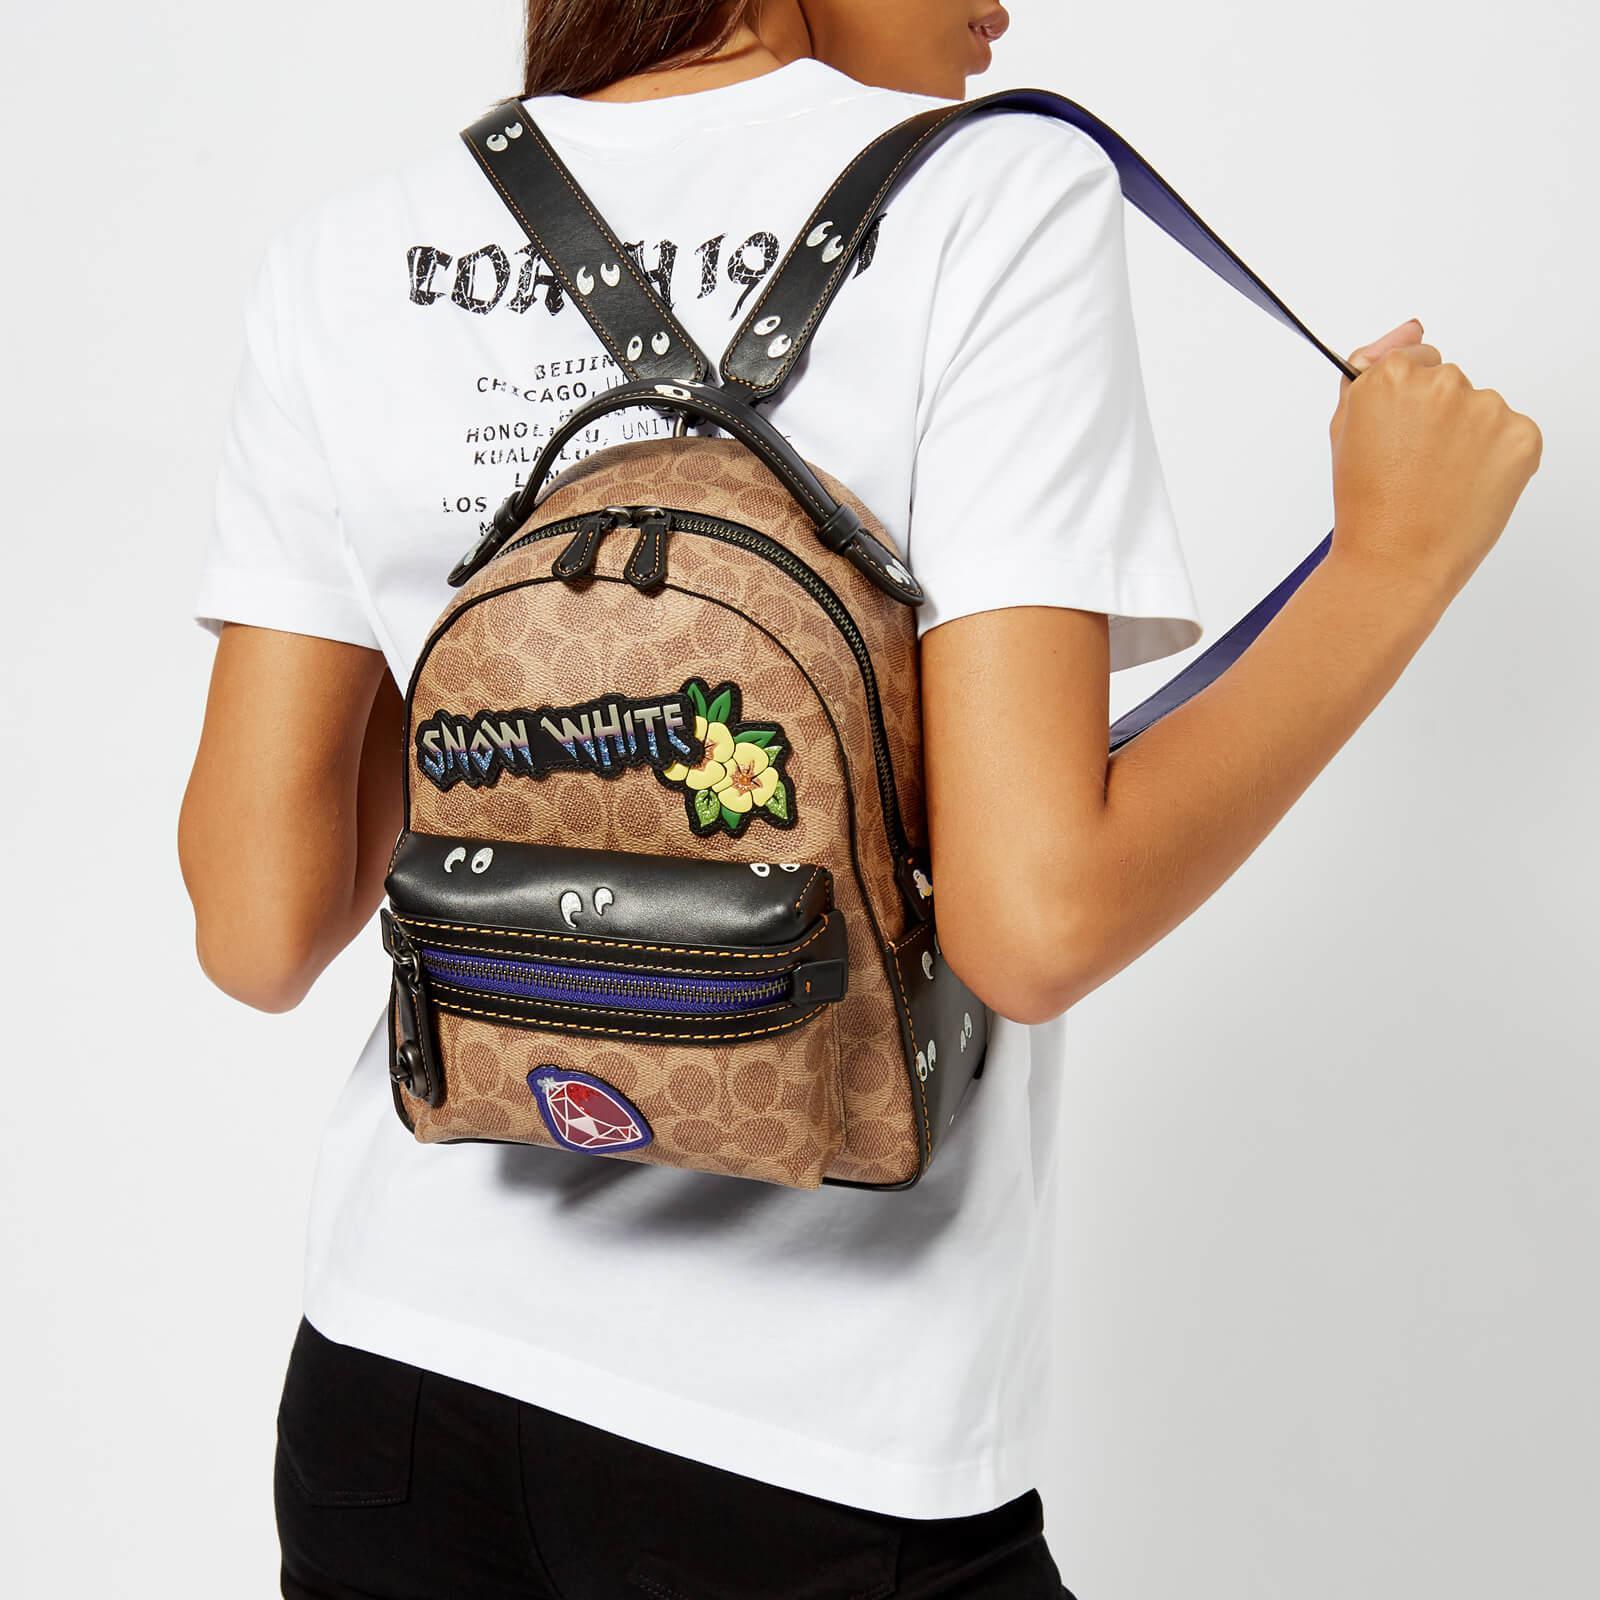 691b0cb9b COACH Disney X Coach Coated Canvas Snow White Campus Backpack 23 - Lyst